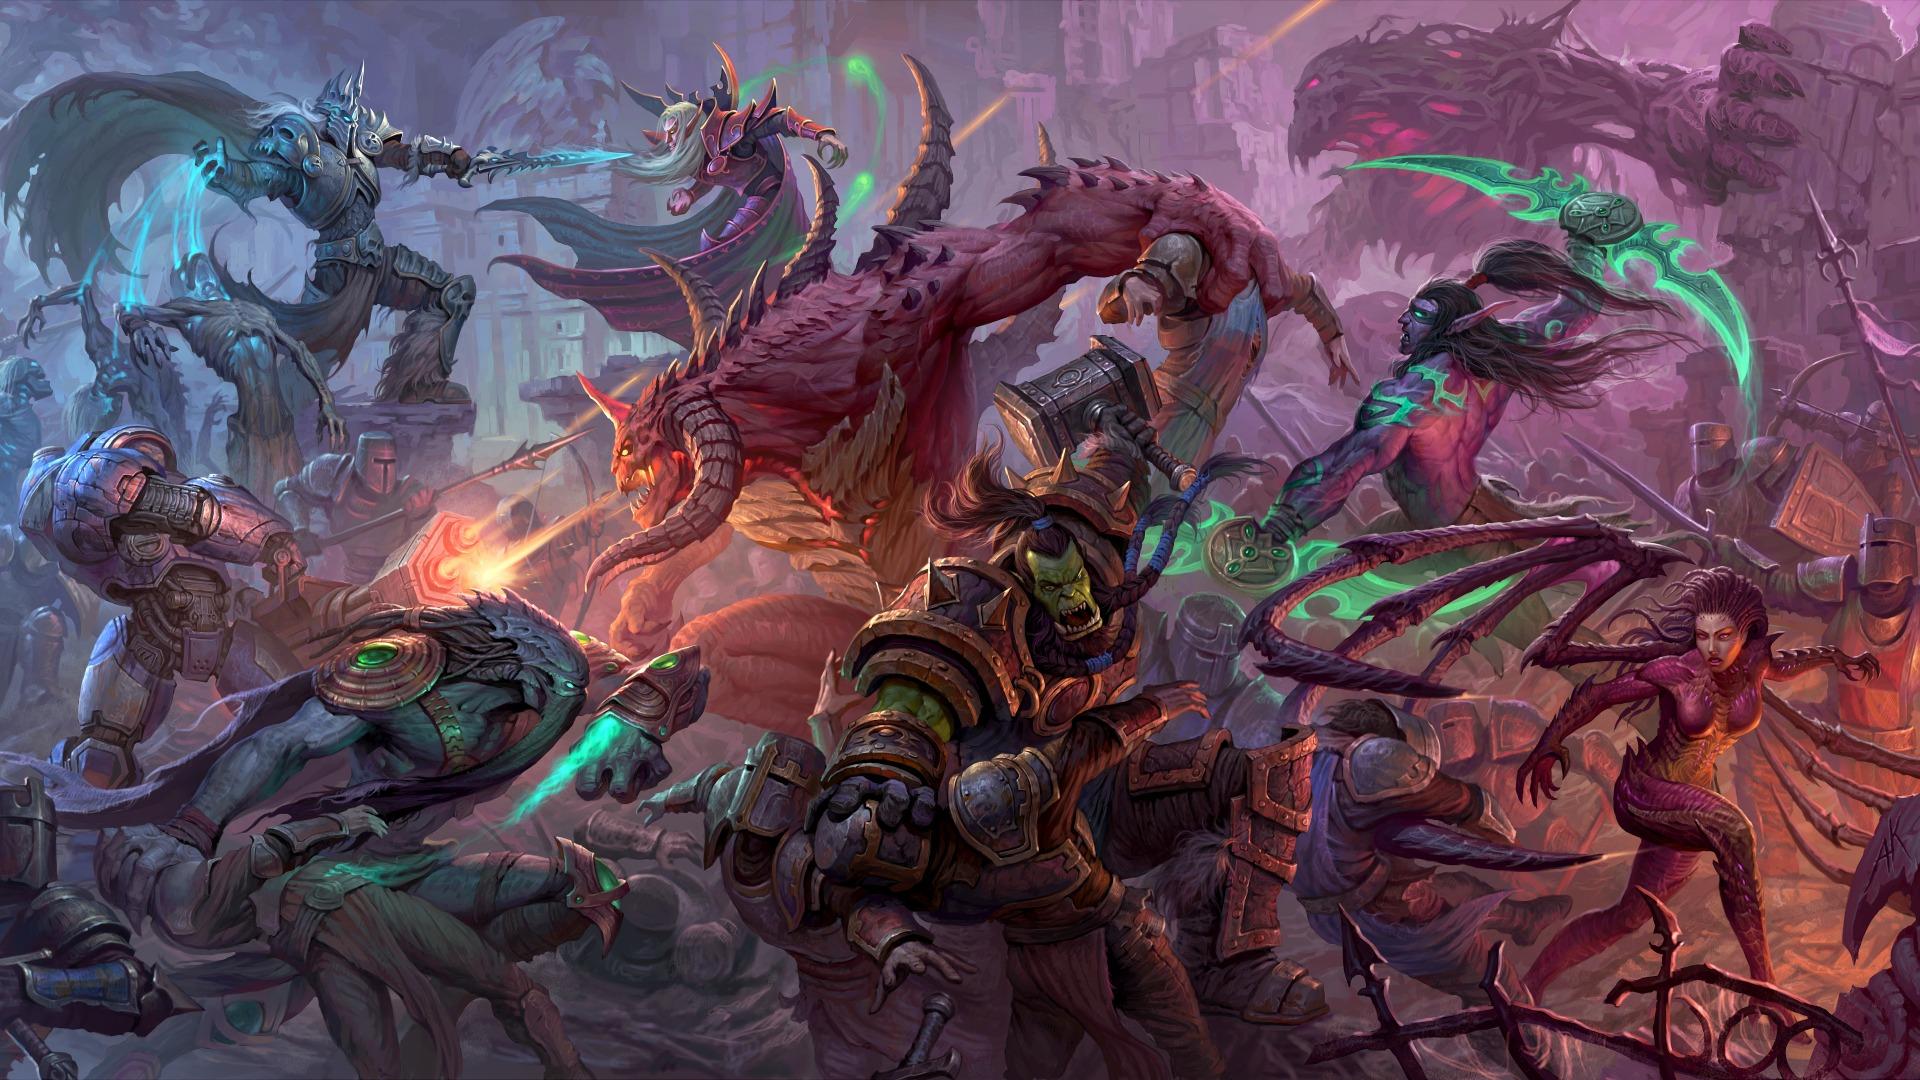 Heroes Of The Storm Art Book - HD Wallpaper